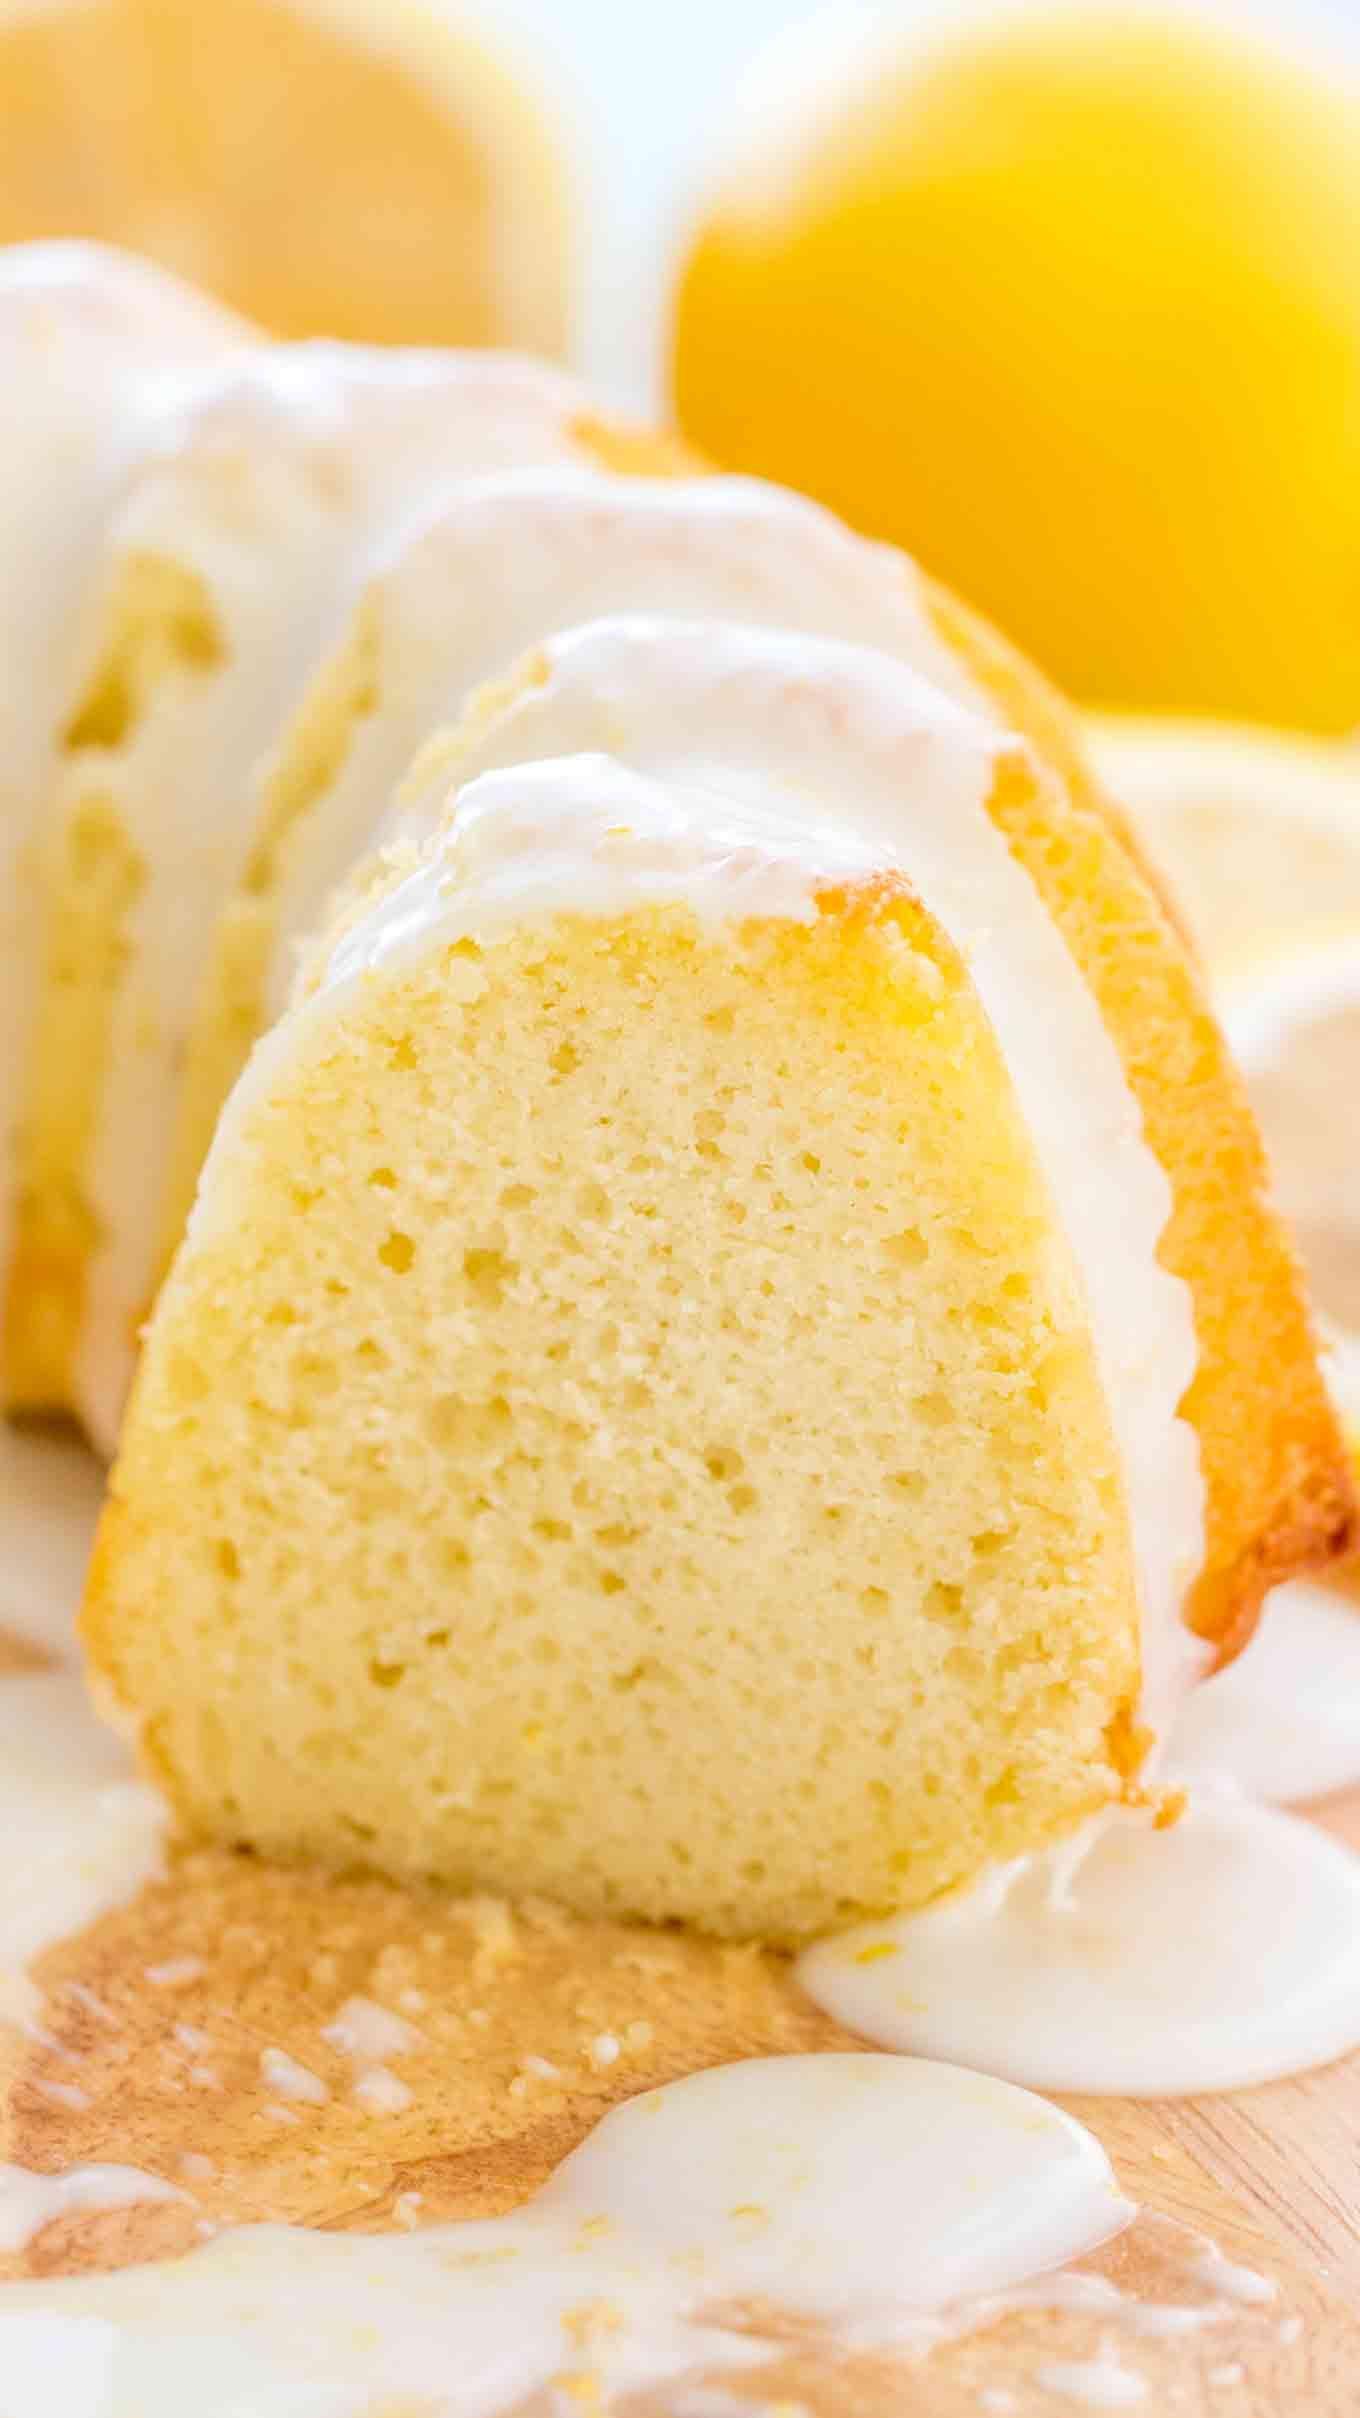 Lemon Bundt Cake Video Sweet And Savory Meals Recipe Lemon Bundt Cake Yellow Cake Mixes Lemon Bundt Cake Recipe